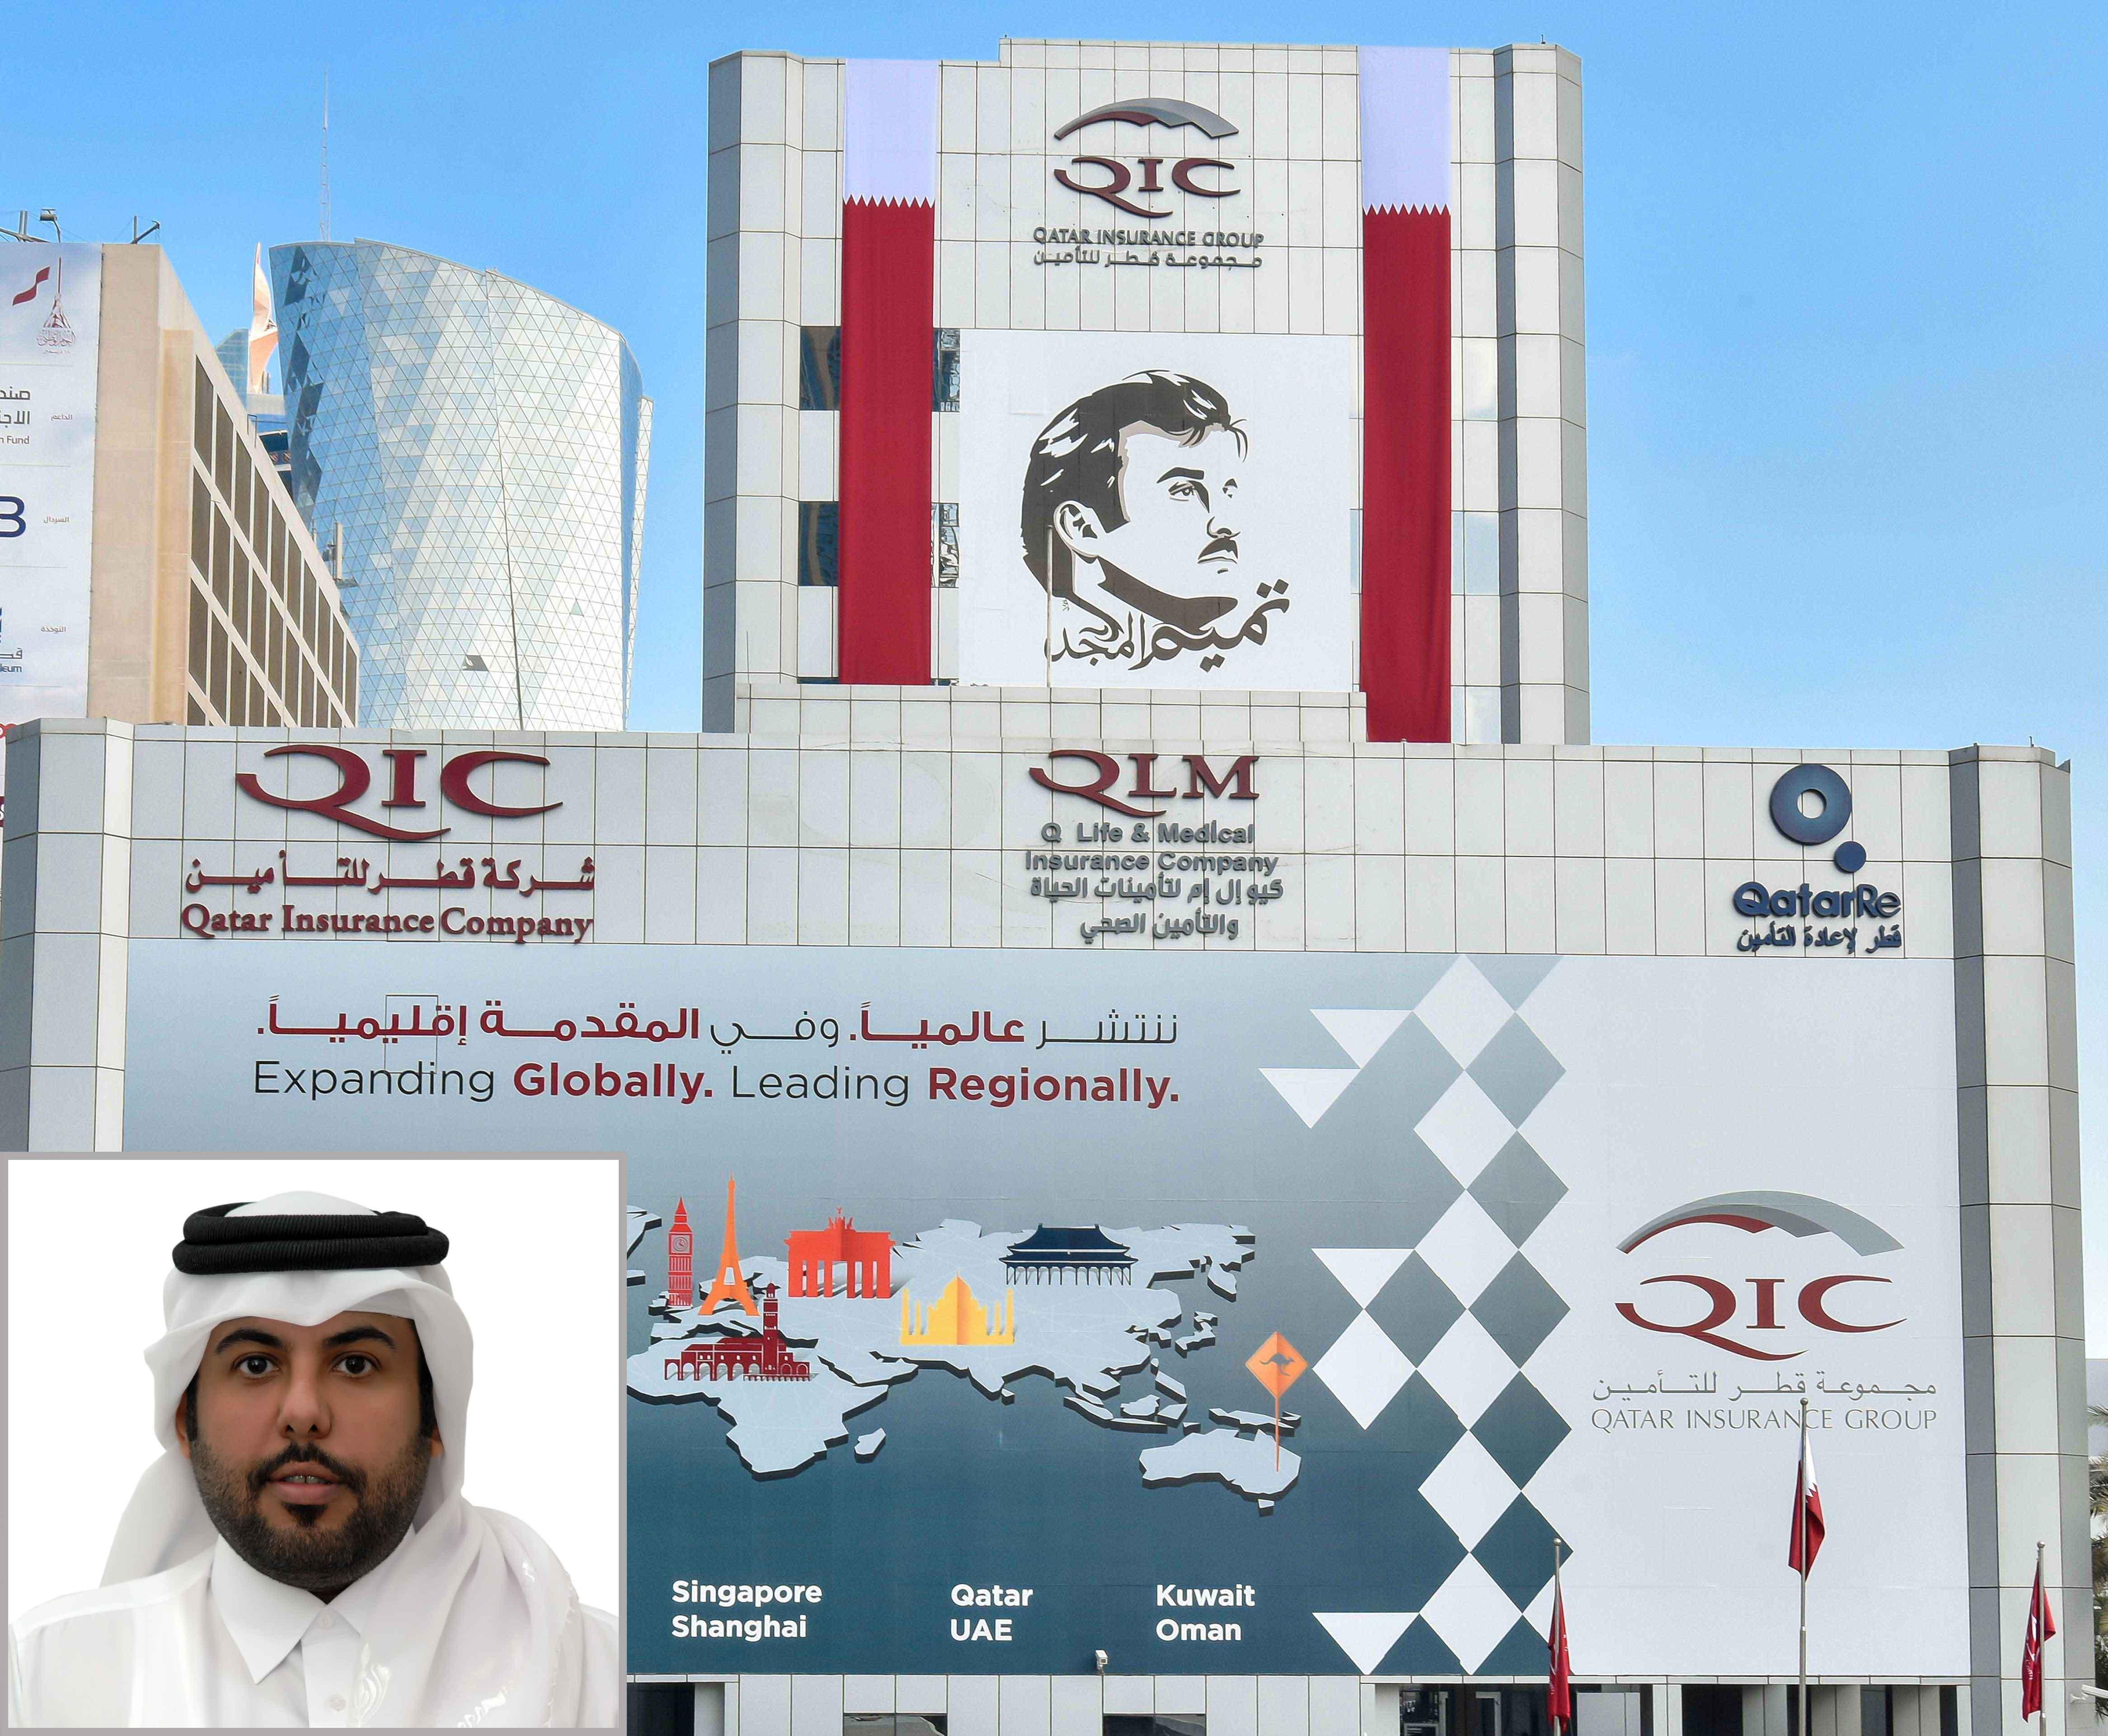 QIC - Qatar Insurance Company, Doha